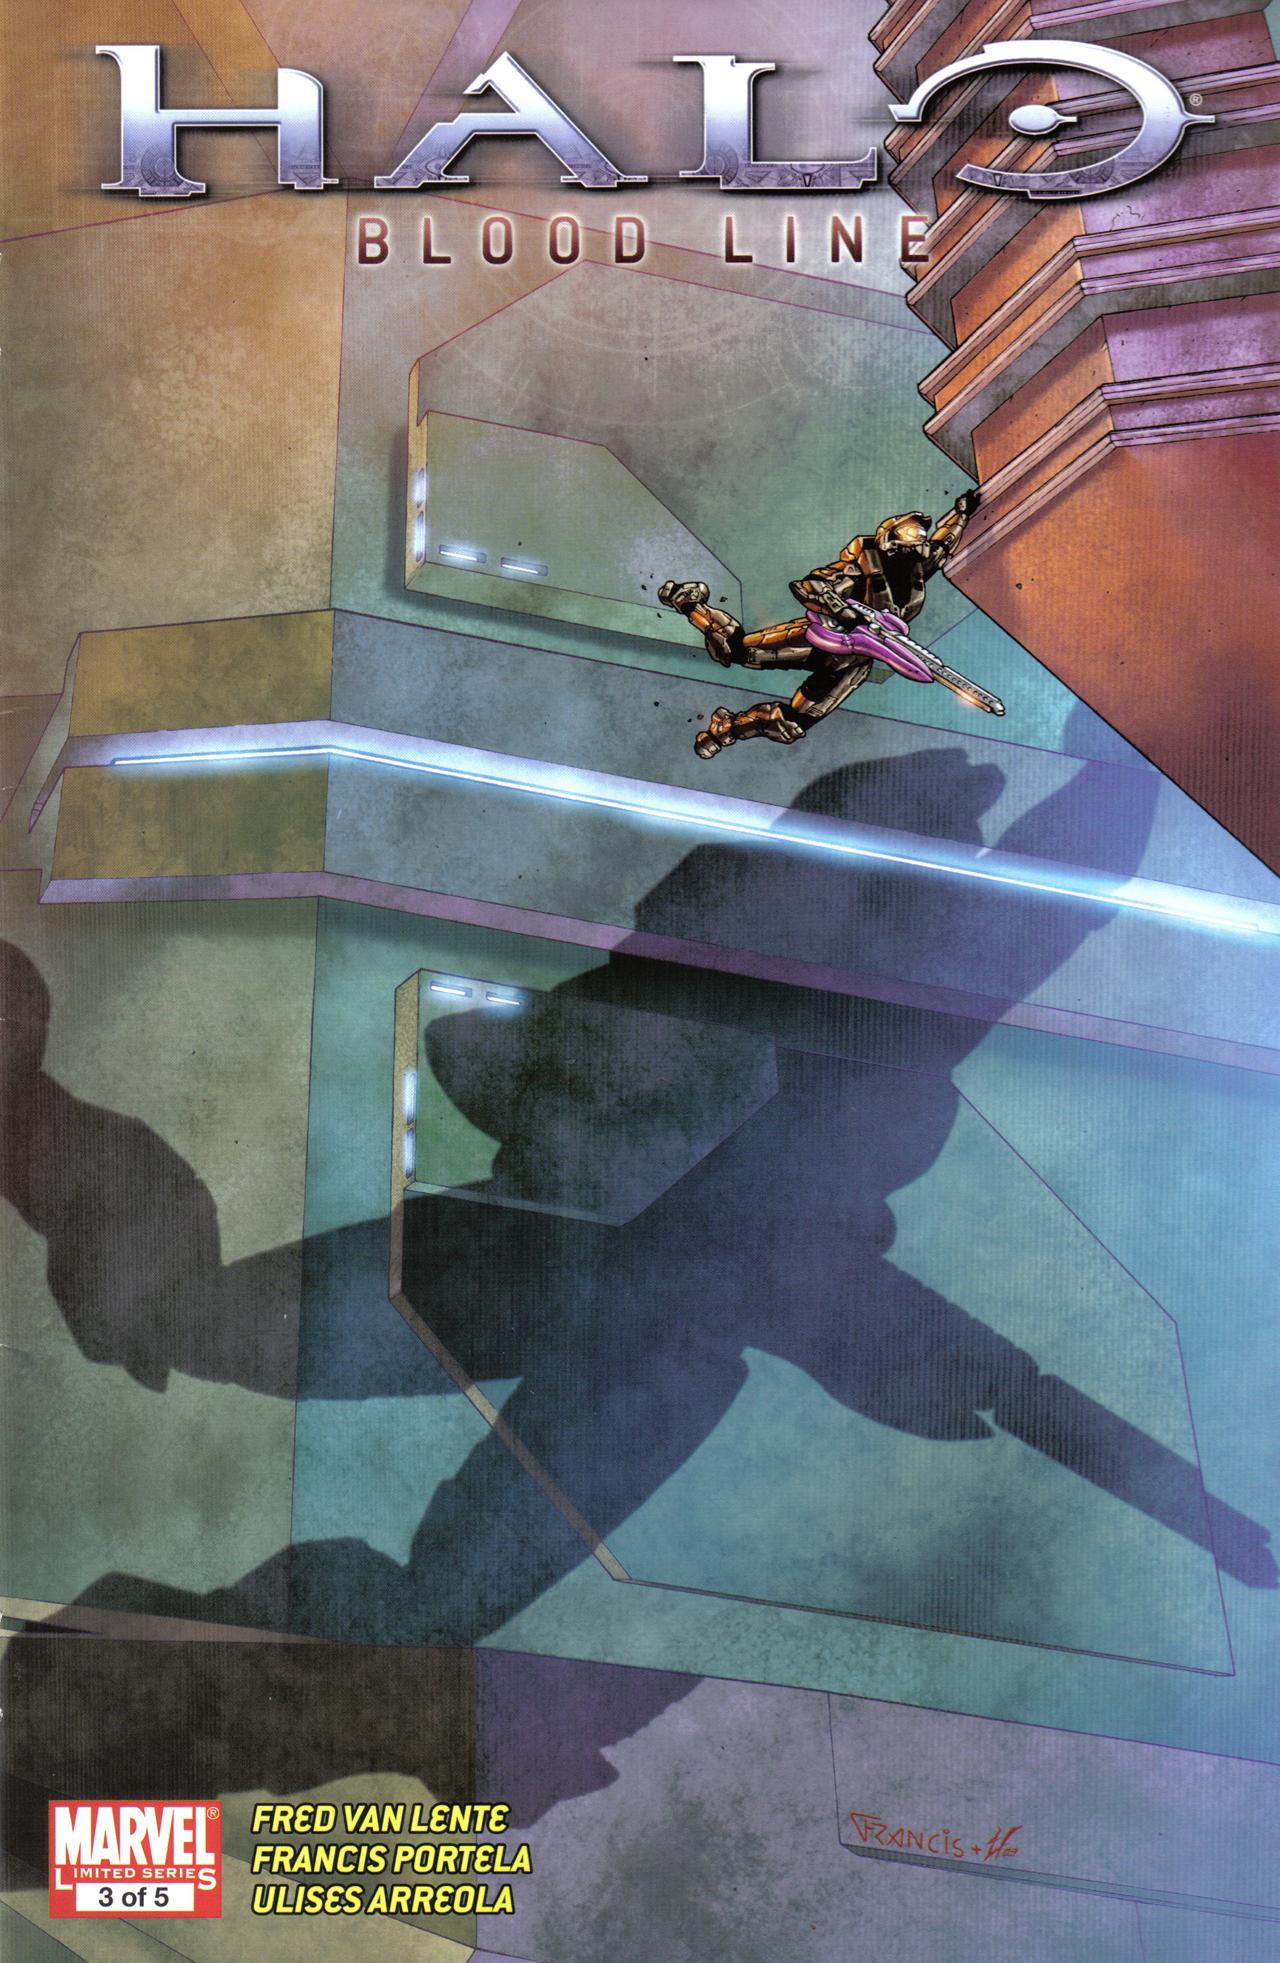 Halo - Blood line 3 - Halo, Blood Line Chapter 3